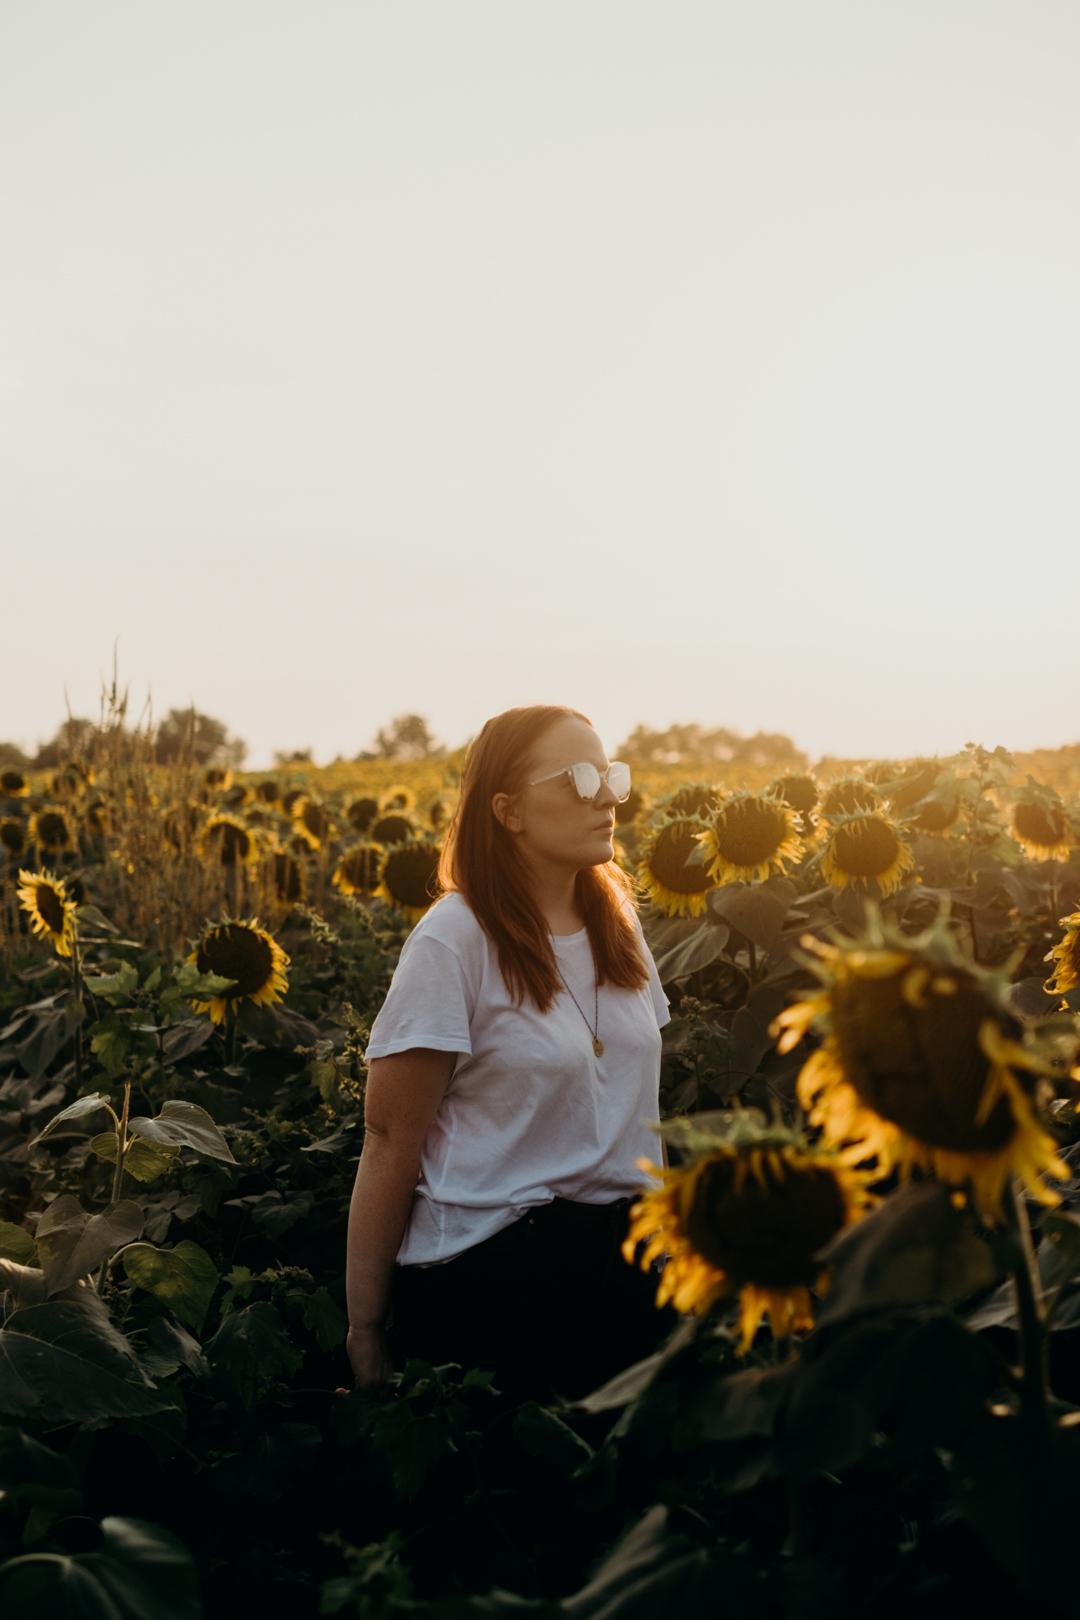 20170909_Grinters Farms Sunflower Fields Lawrence Kansas__17.jpg